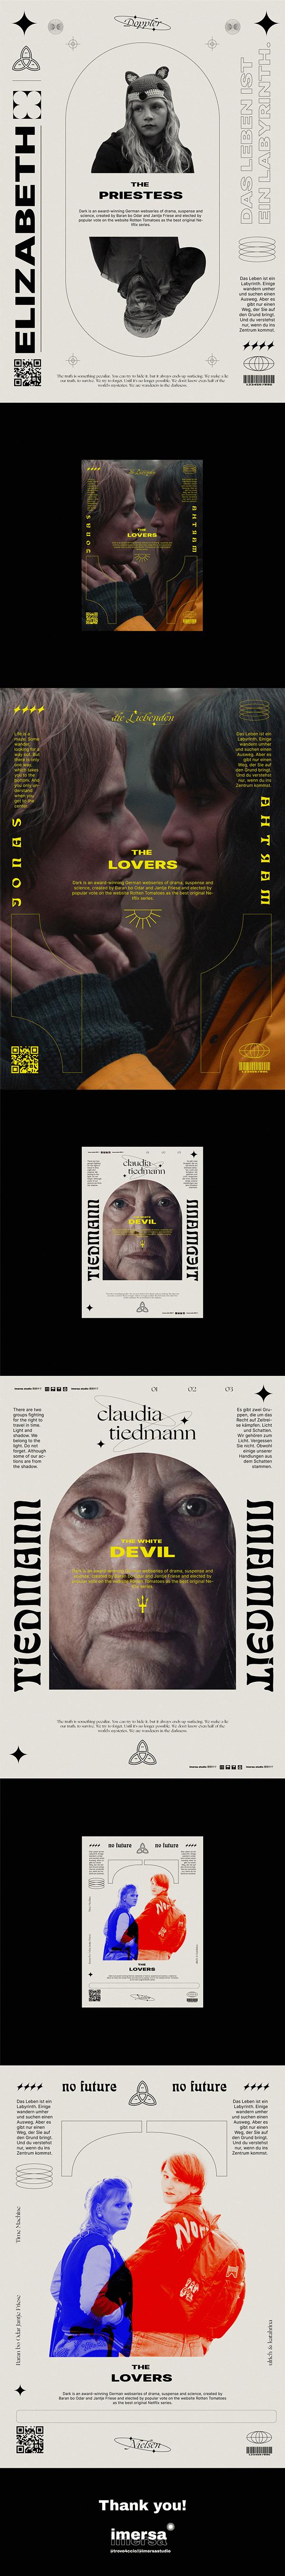 Acid Poster #2 Dark